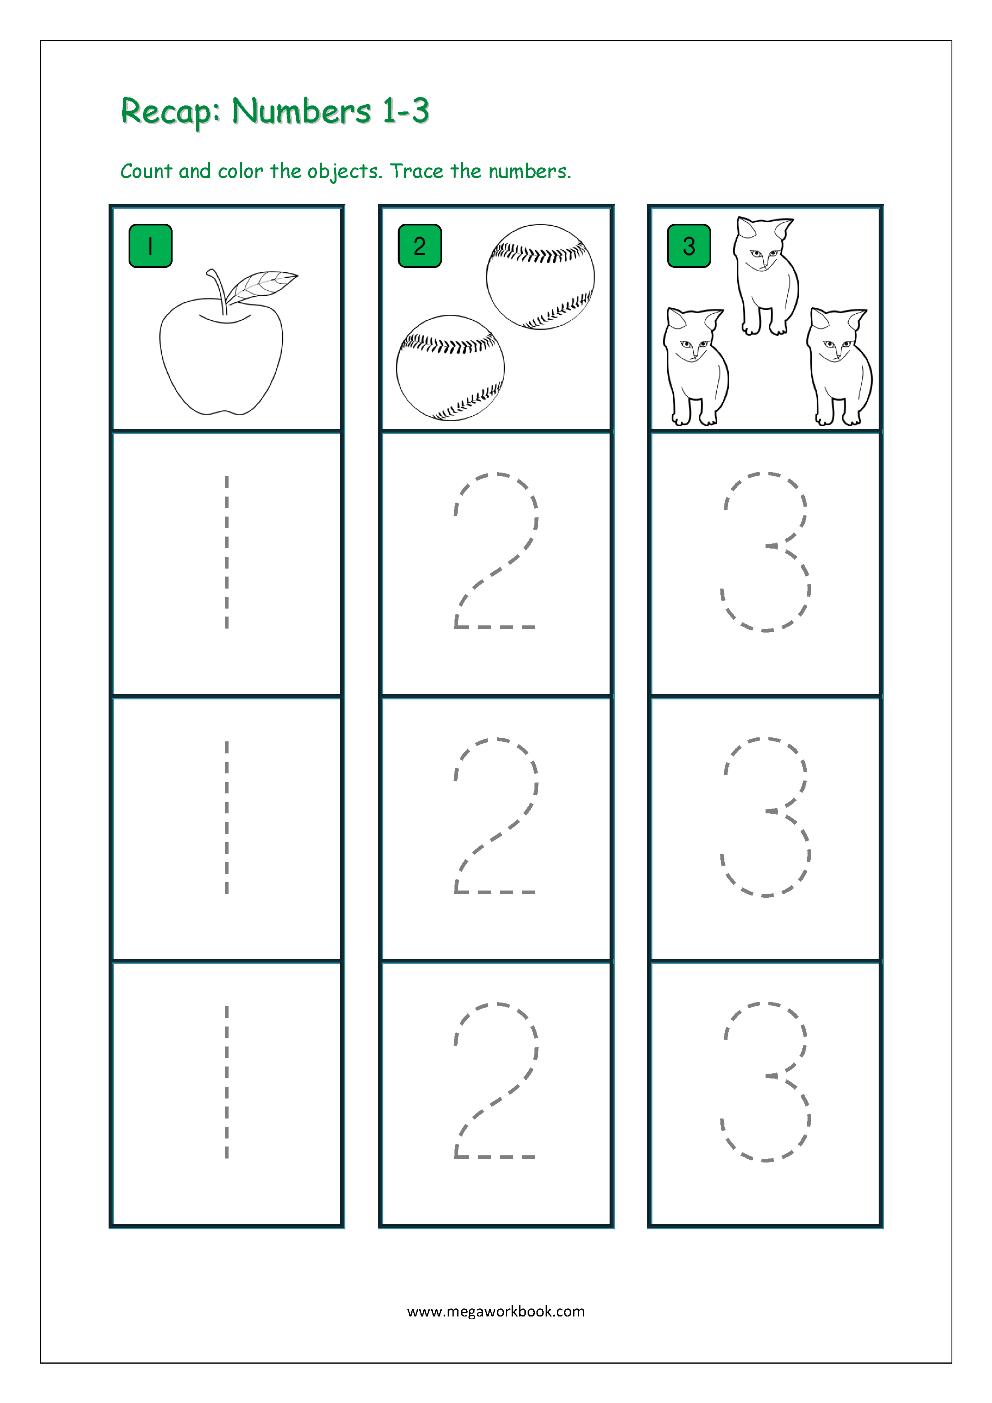 Number Tracing - Tracing Numbers - Number Tracing ...